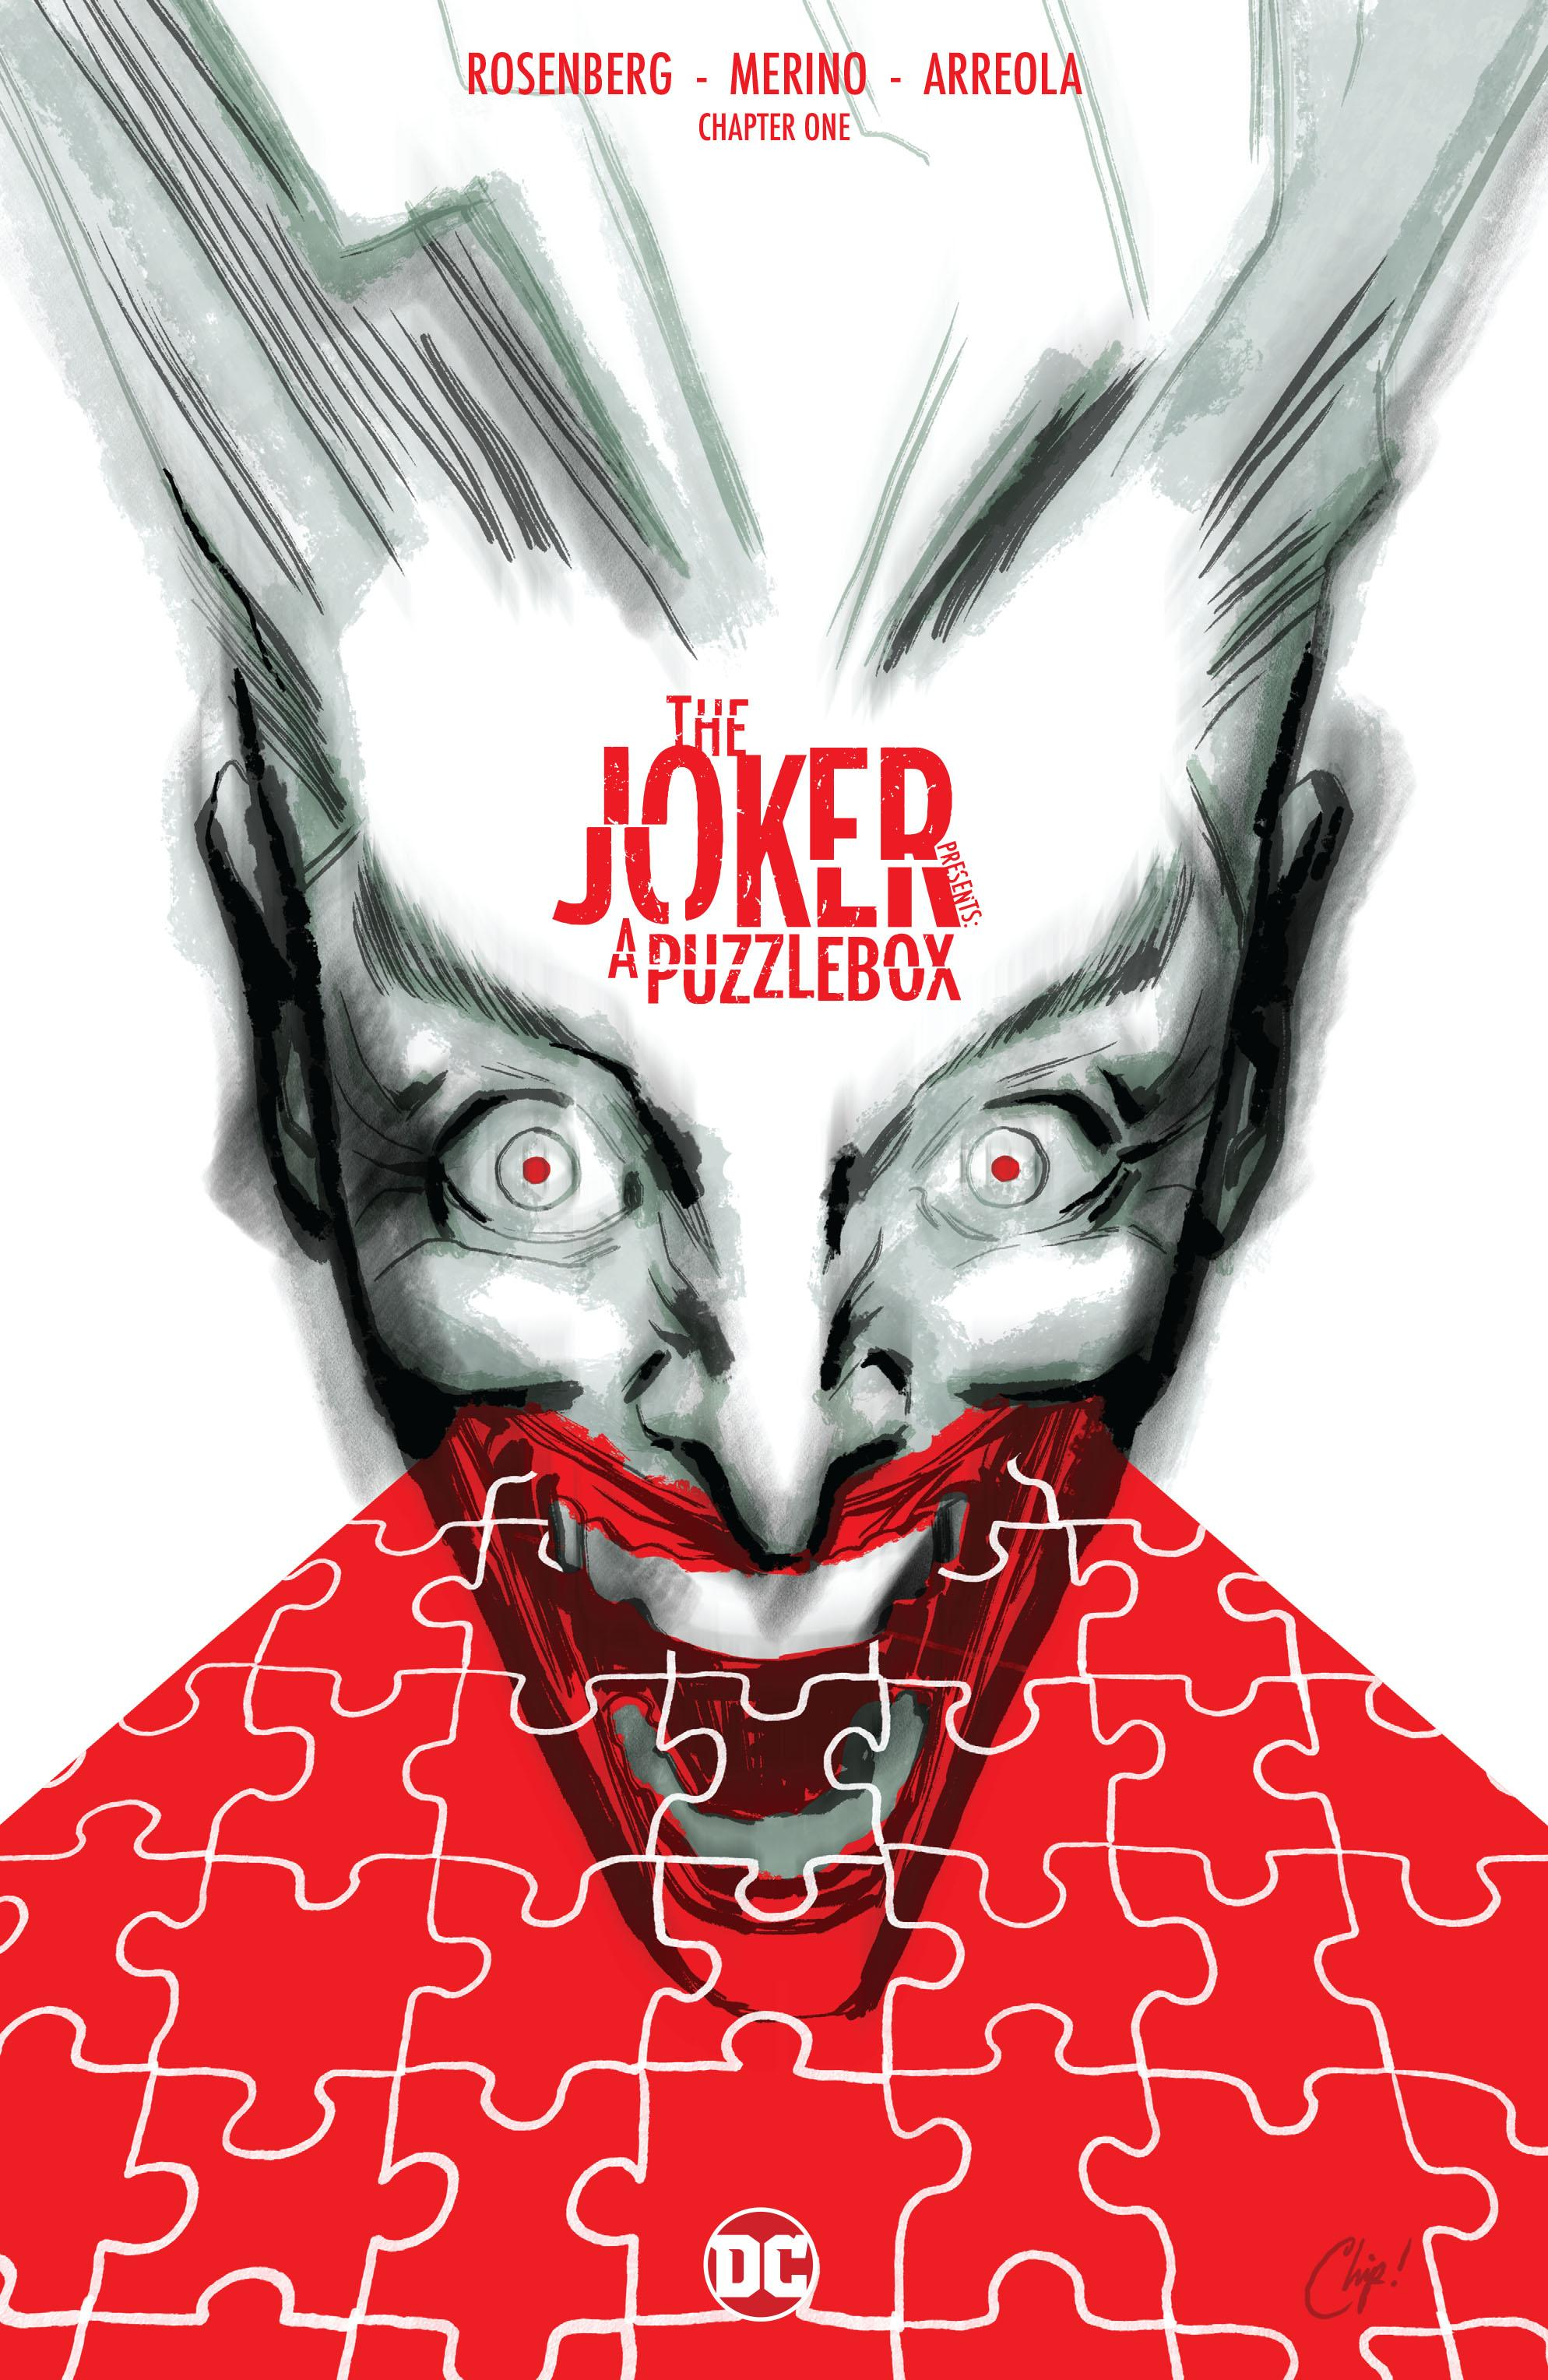 The Joker Presents - A Puzzlebox 001 (2021) (digital) (Son of Ultron-Empire